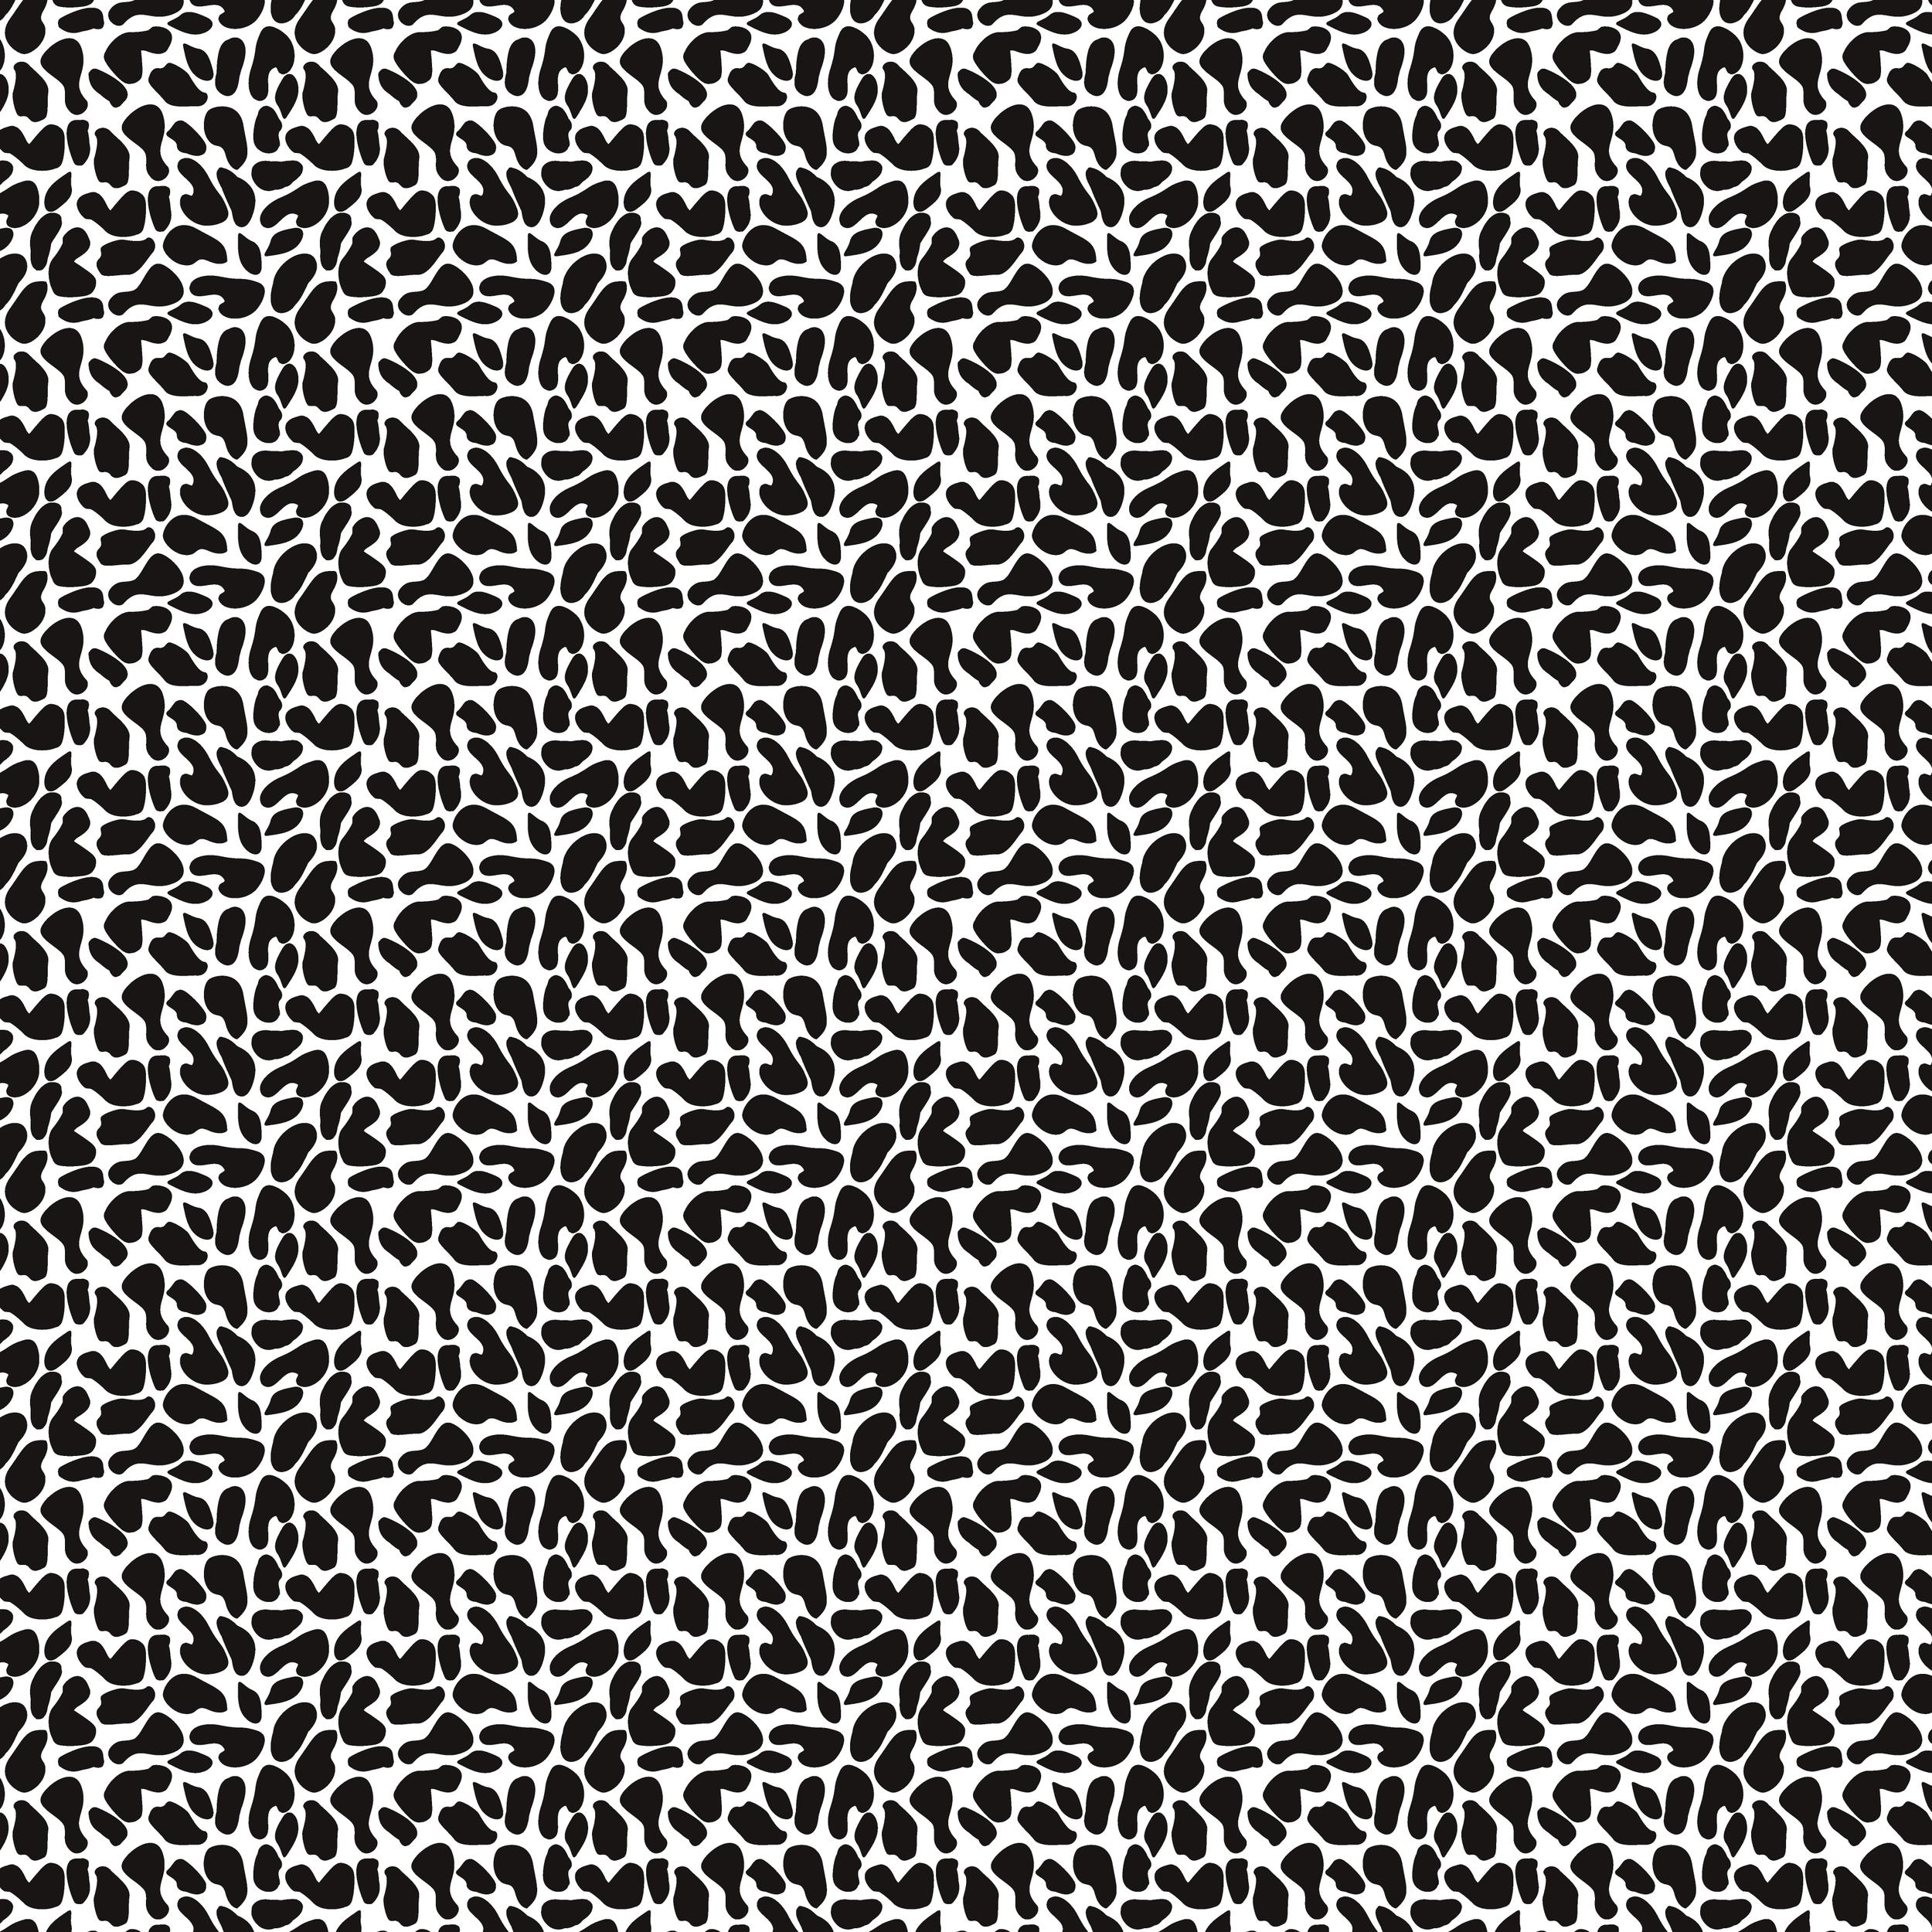 Leopard Patterns_Black & White_300 dpi.png